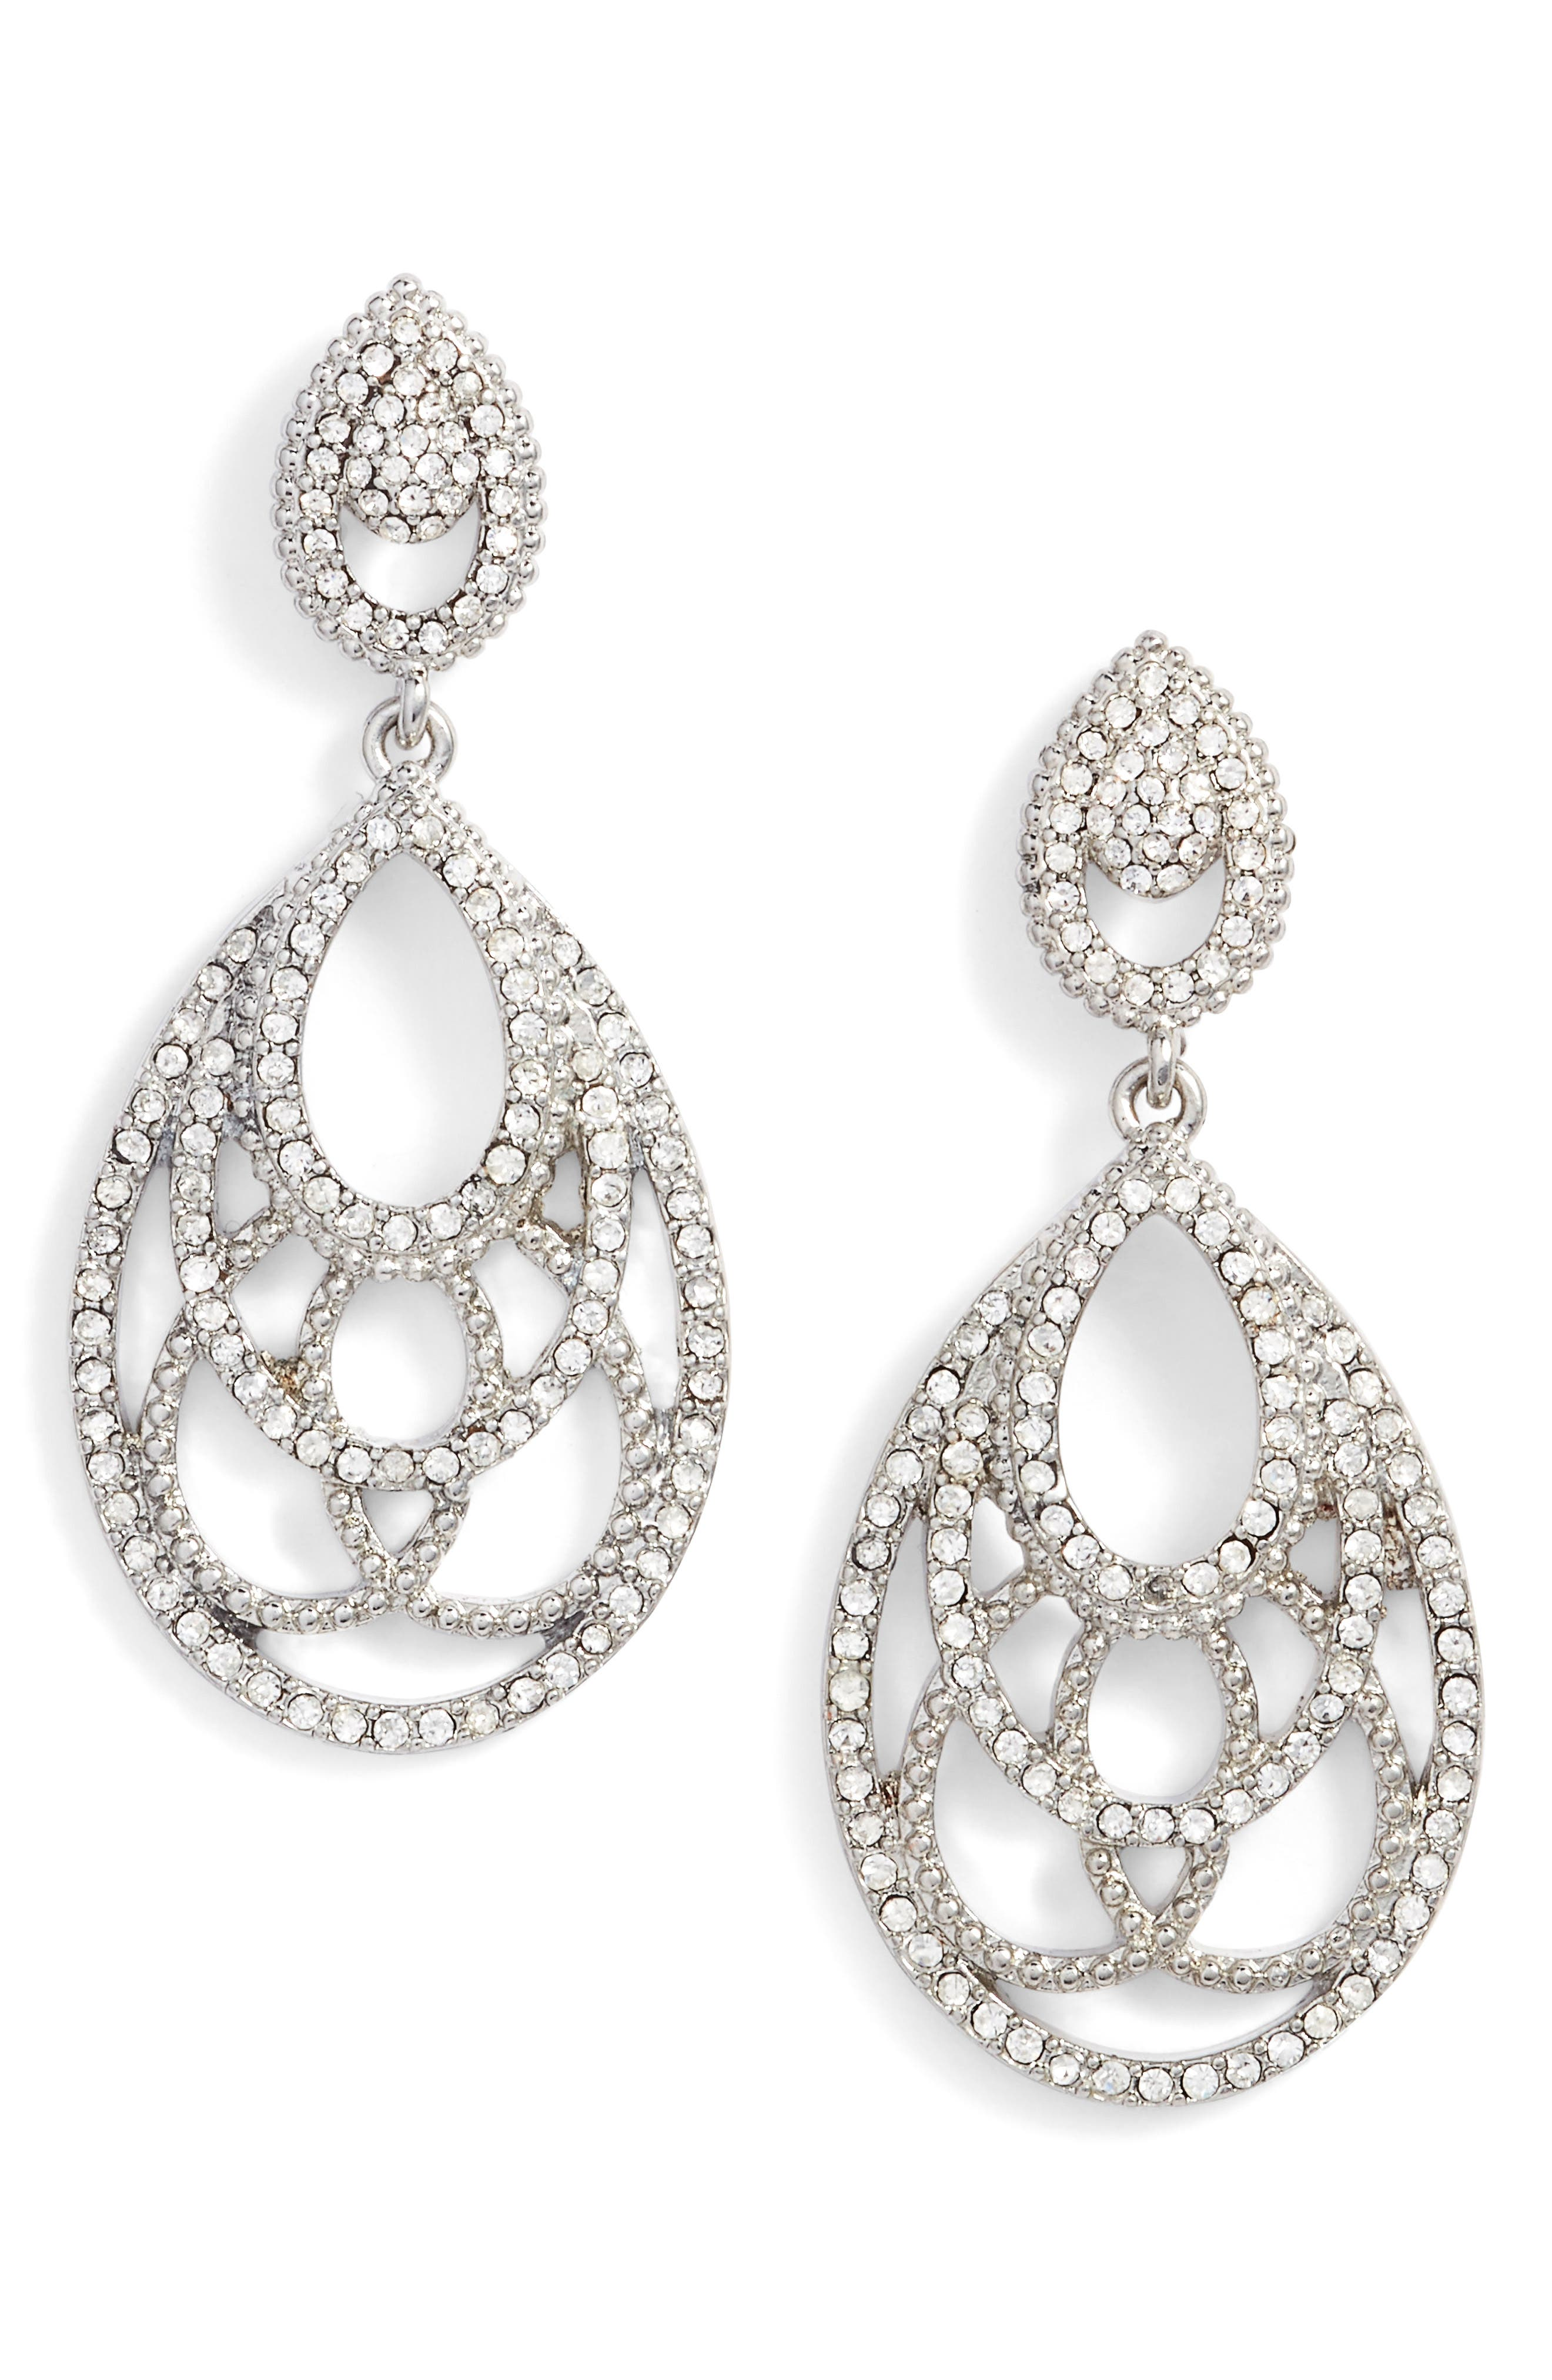 Main Image - Jenny Packham Openwork Crystal Drop Earrings